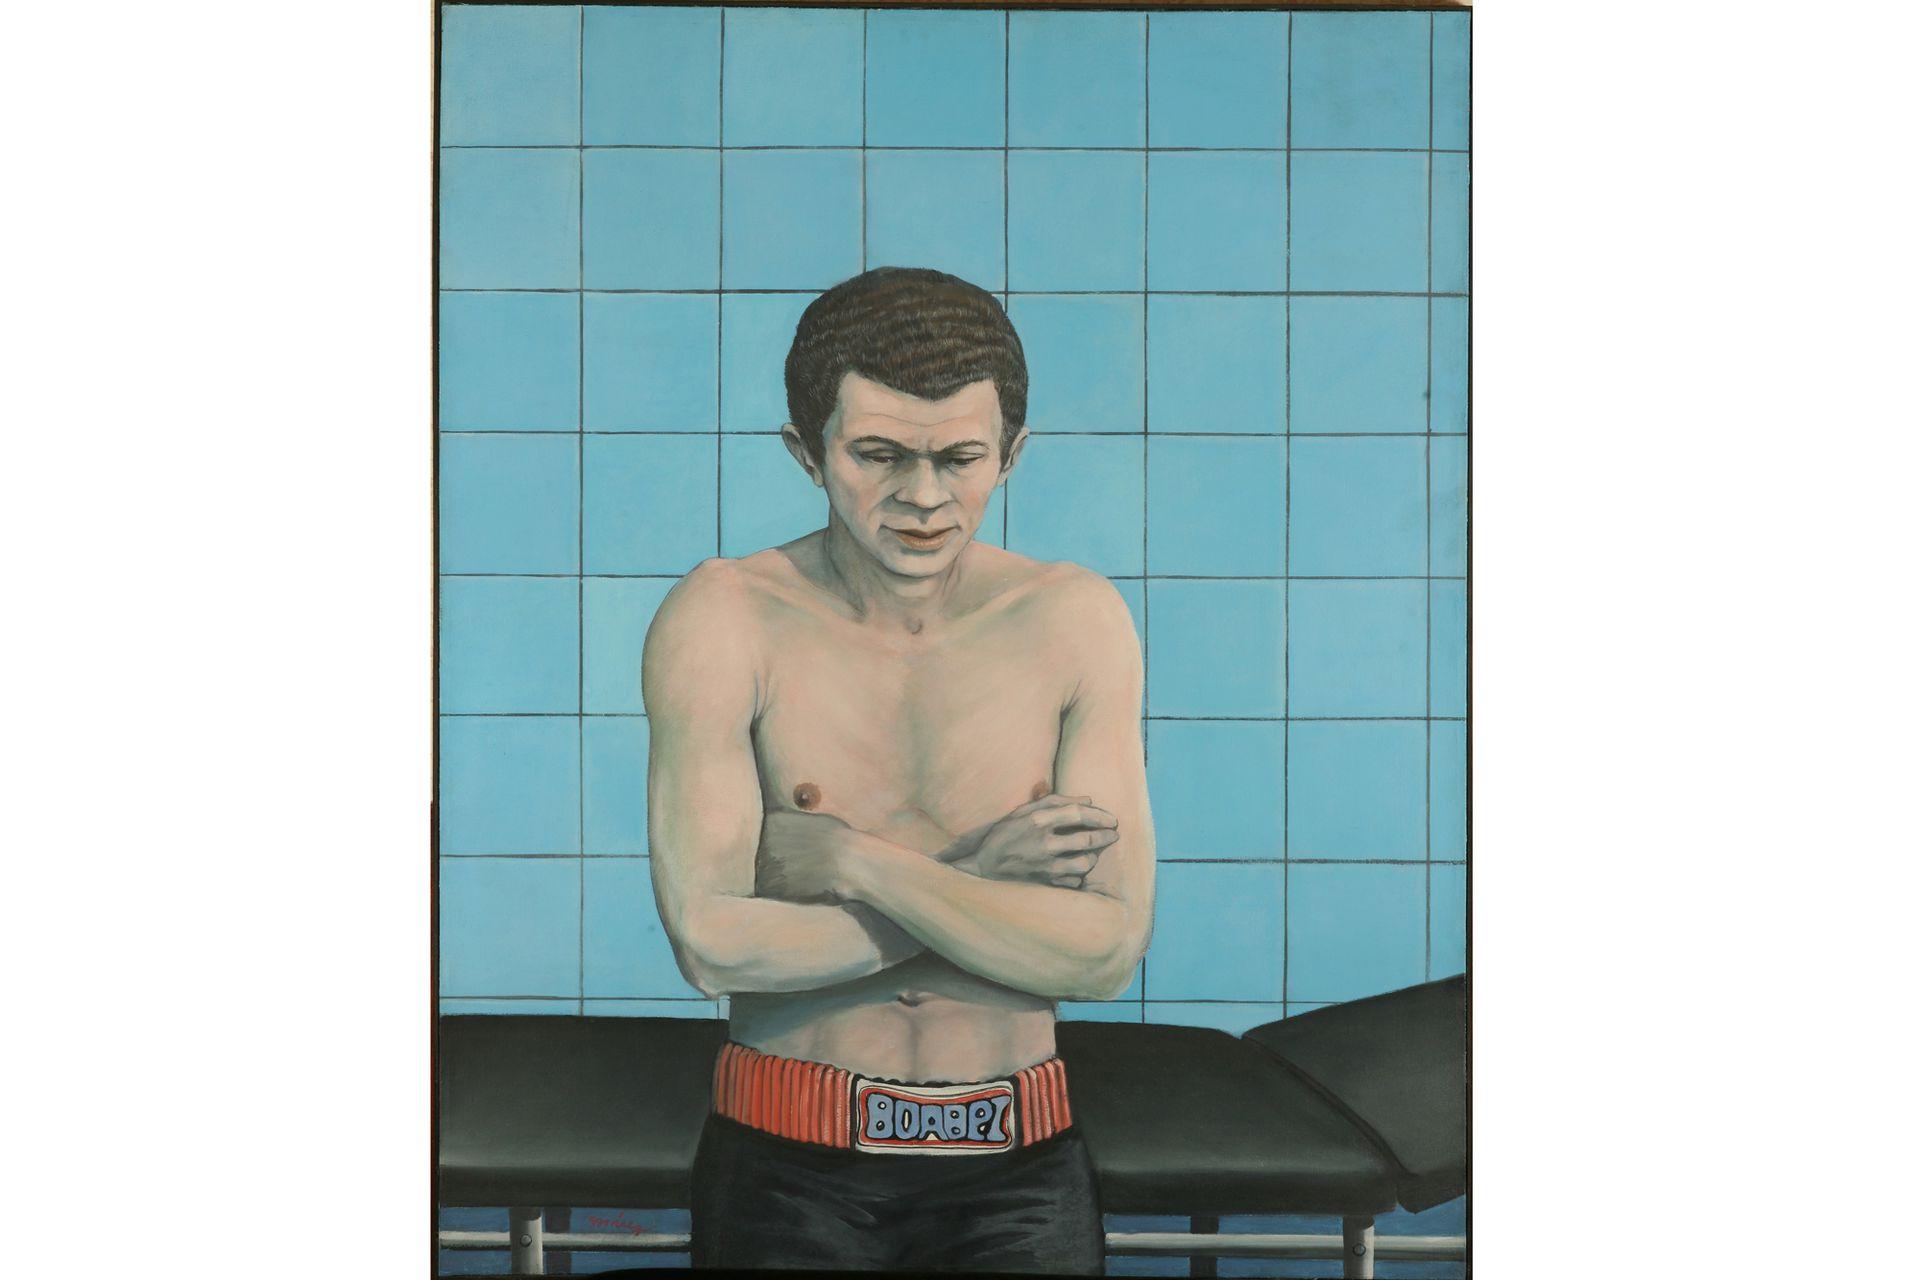 Pablo boxeador, Pablo Suárez, 1977